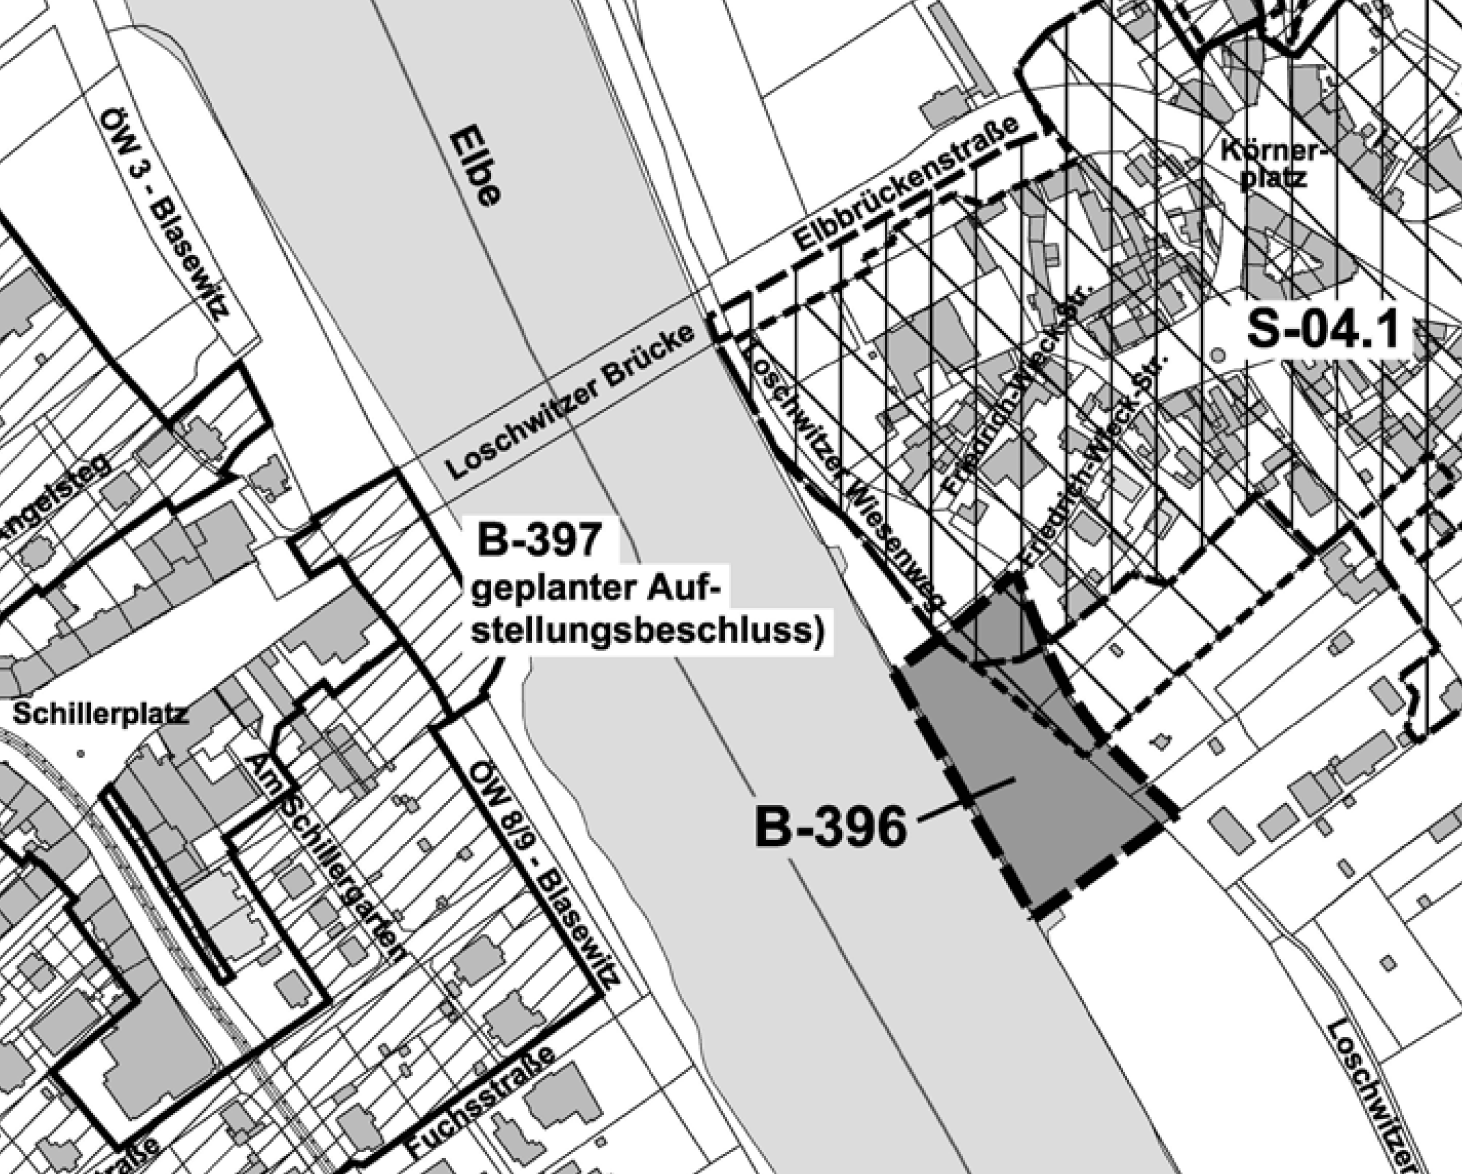 2013-01-17_2xparkplatz-gr